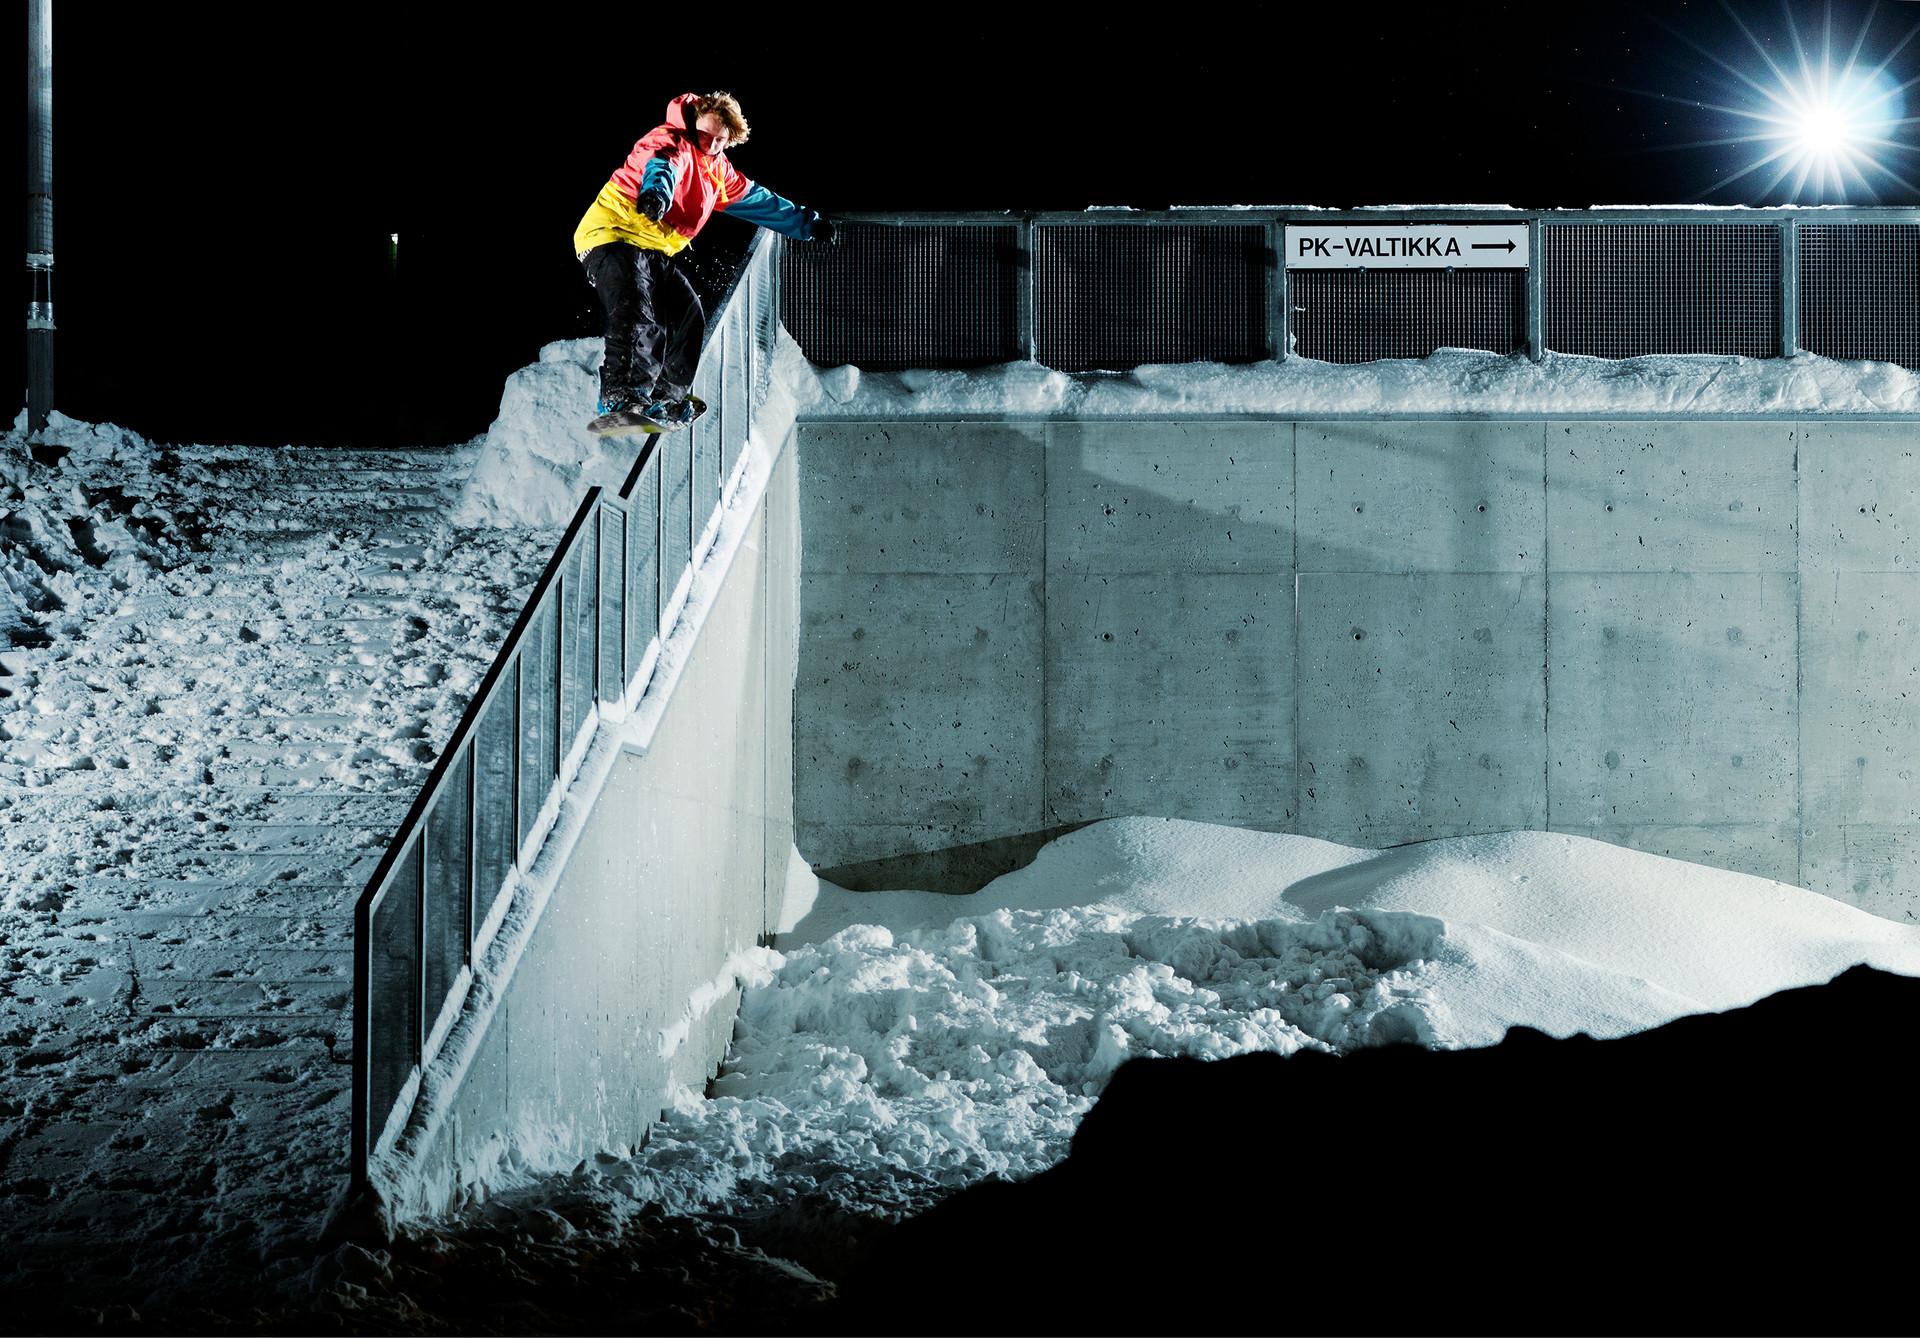 snowboard_02.jpg